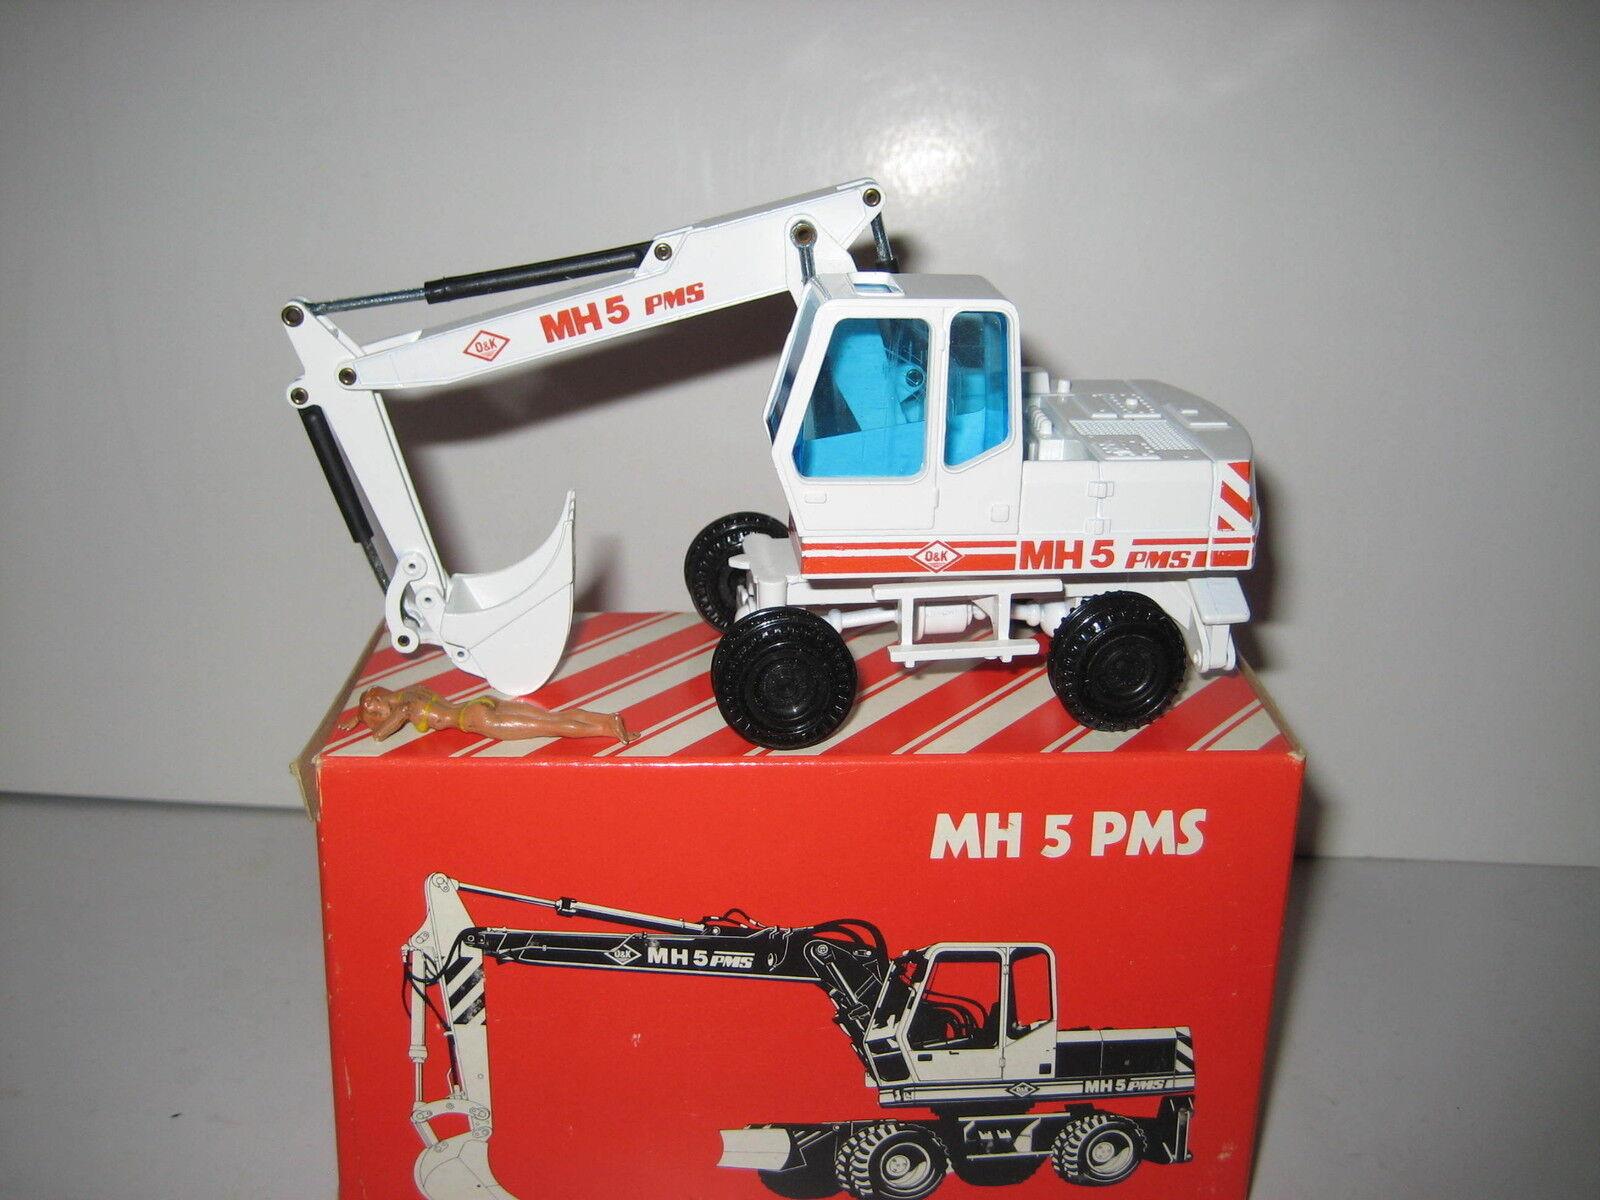 O&k MH 5 PMS excavator Deep Spoon Mobile Weiß  333.2 NZG 1 50 OVP